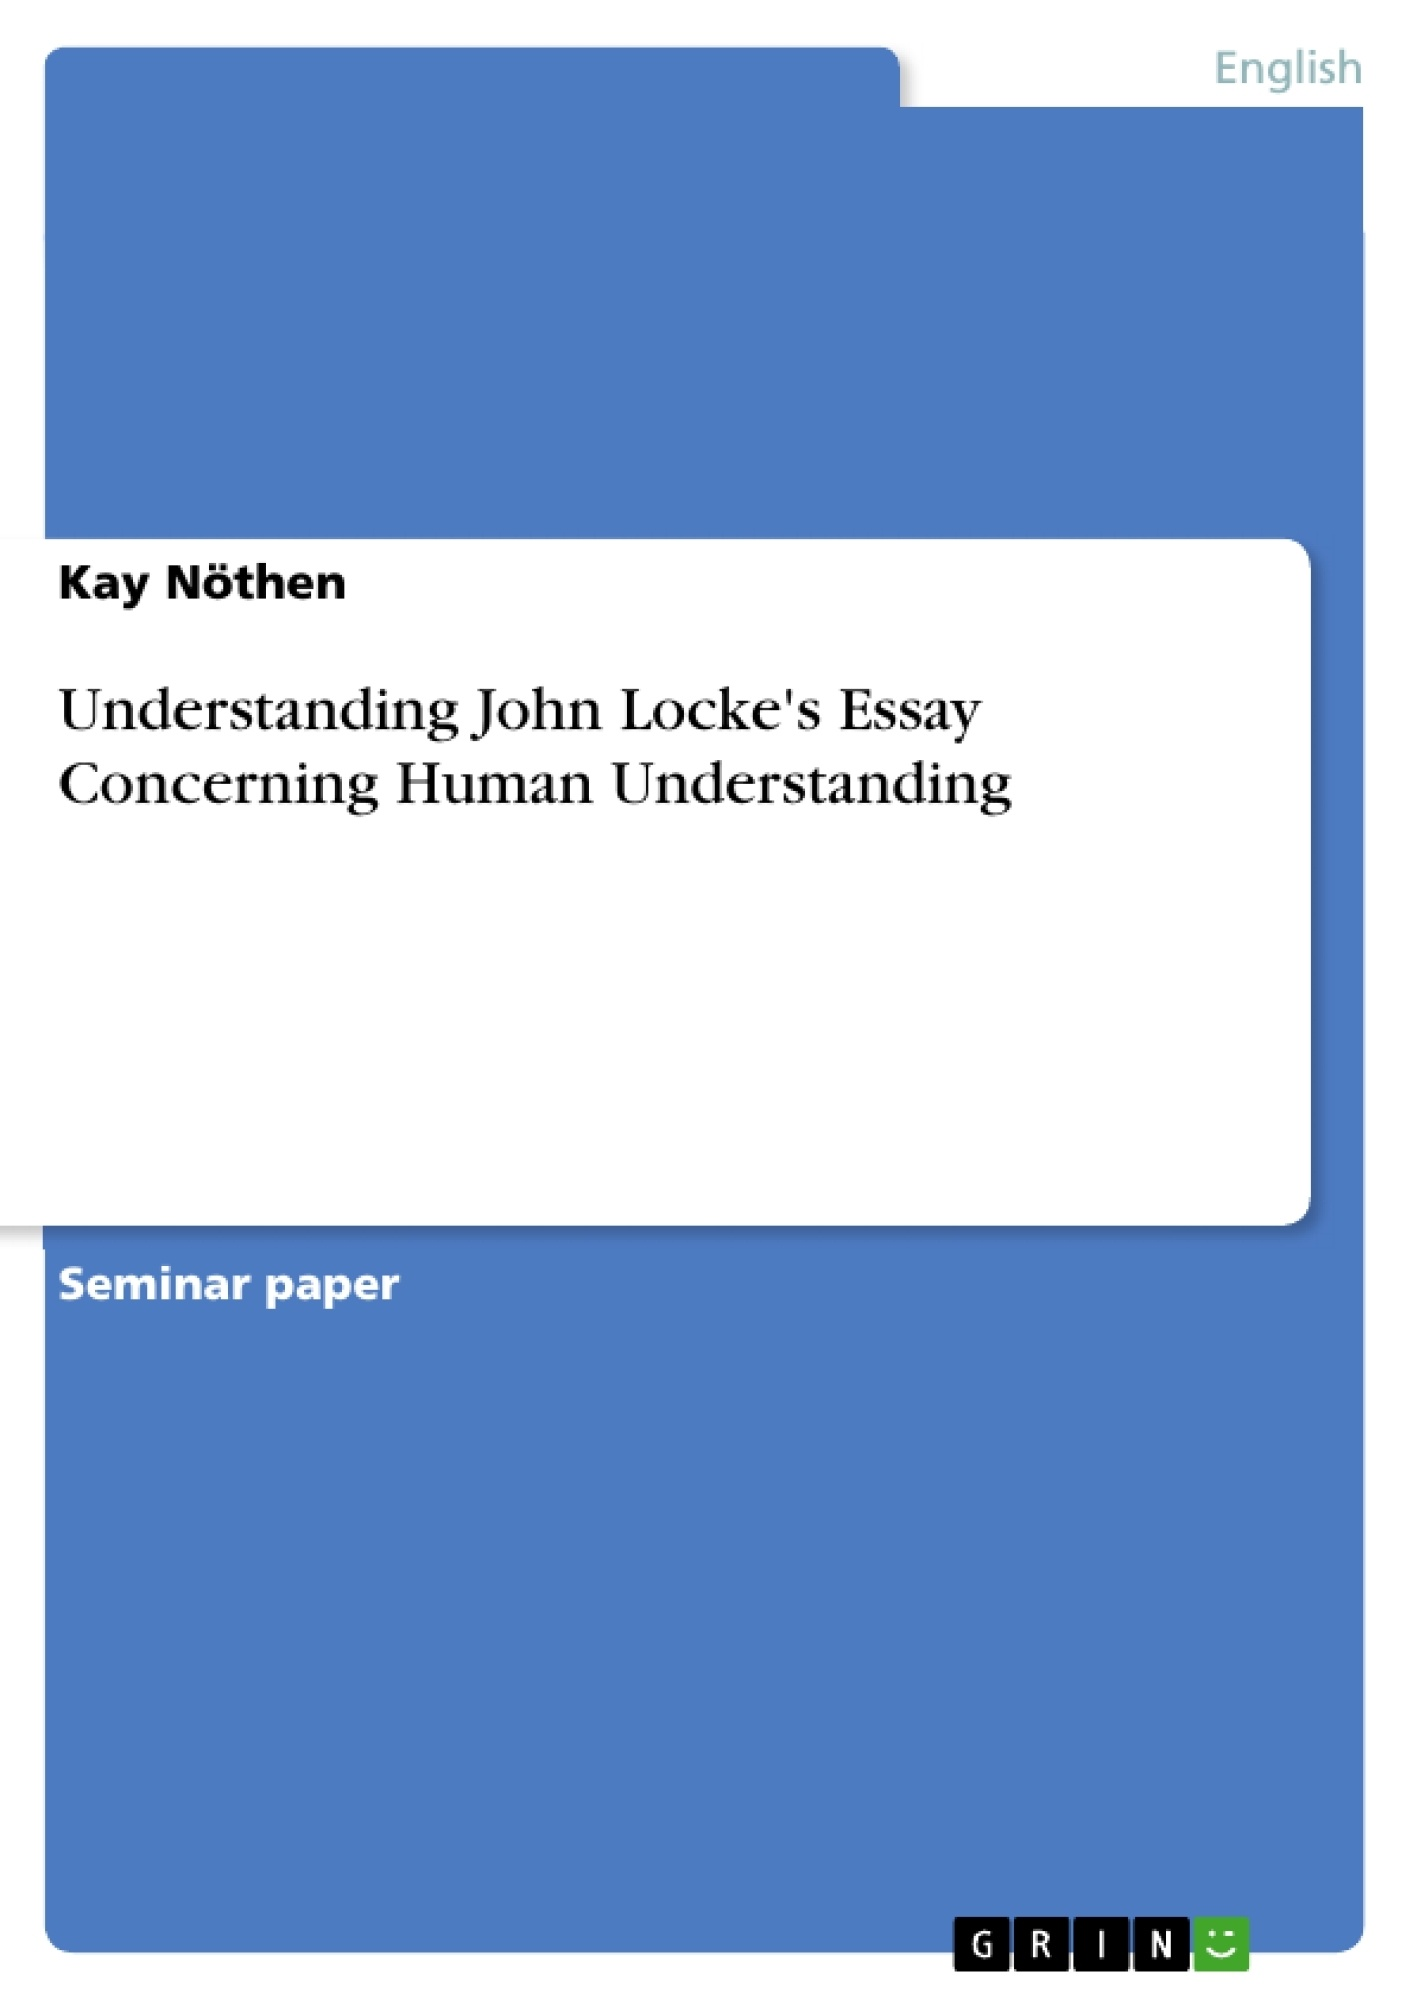 018 Essay Example John Locke 70477 0 Impressive Concerning Human Understanding Book 4 On Pdf Summary Full